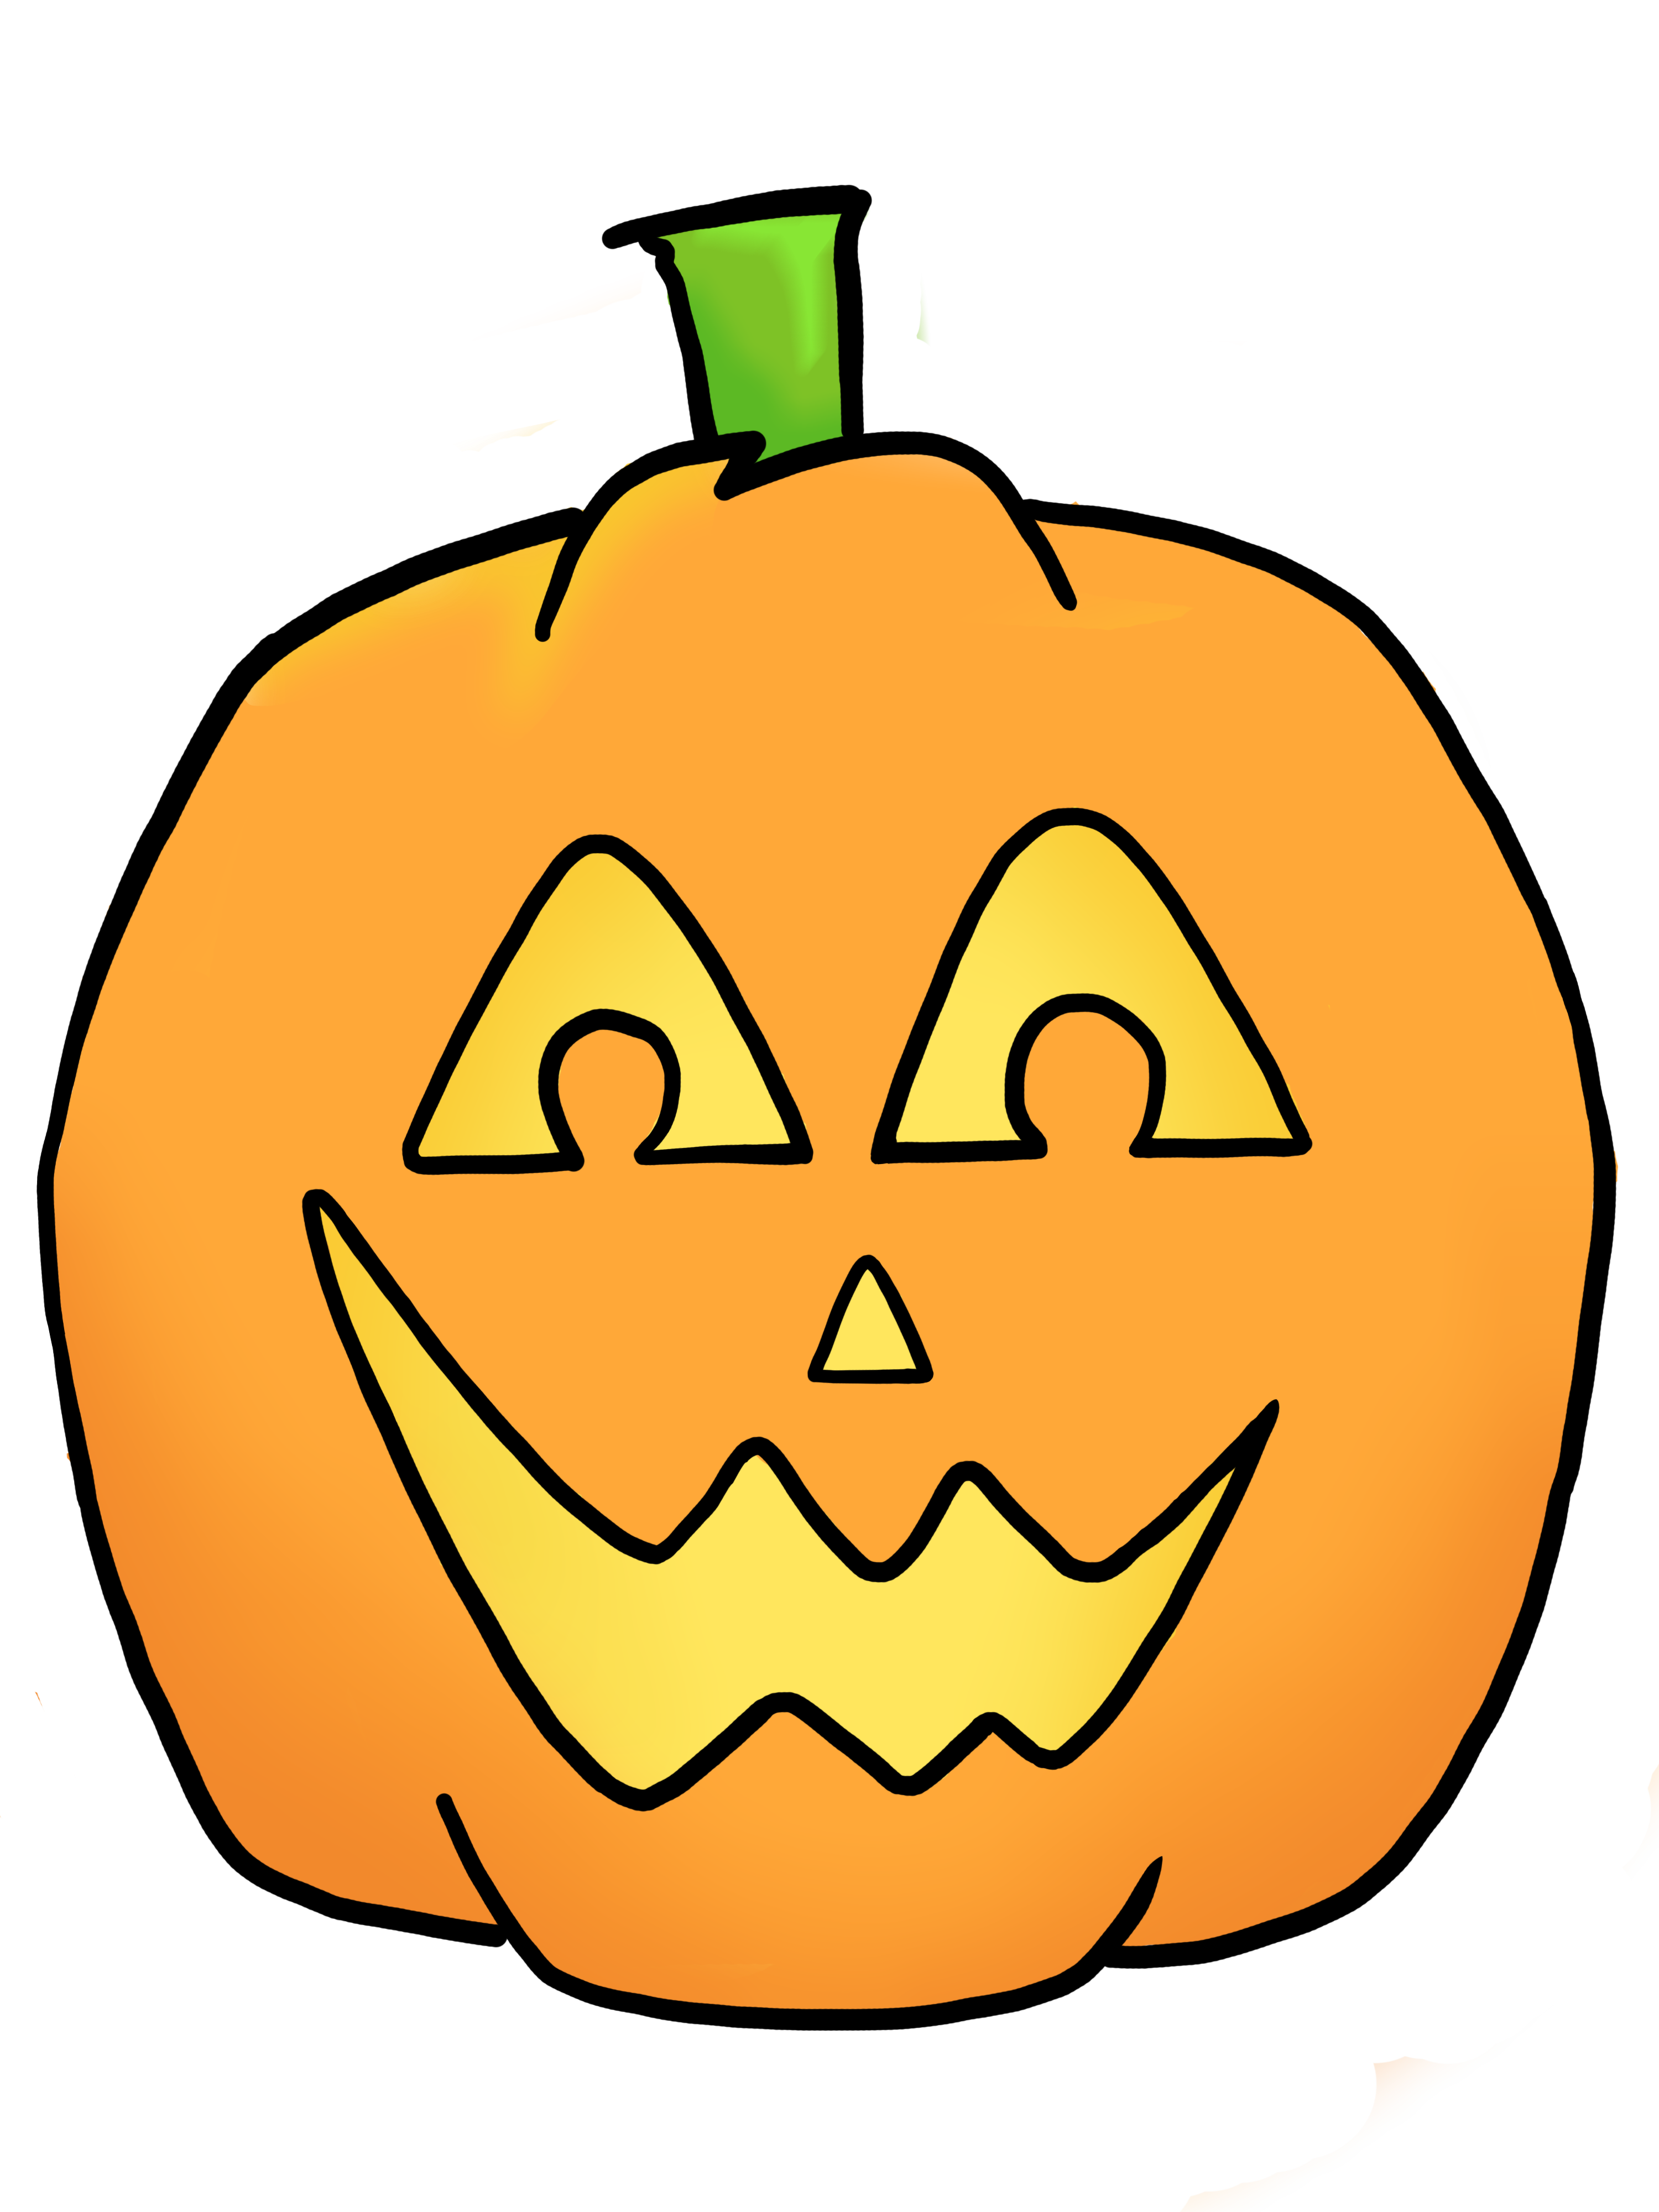 Jack-o'-lantern clipart #14, Download drawings